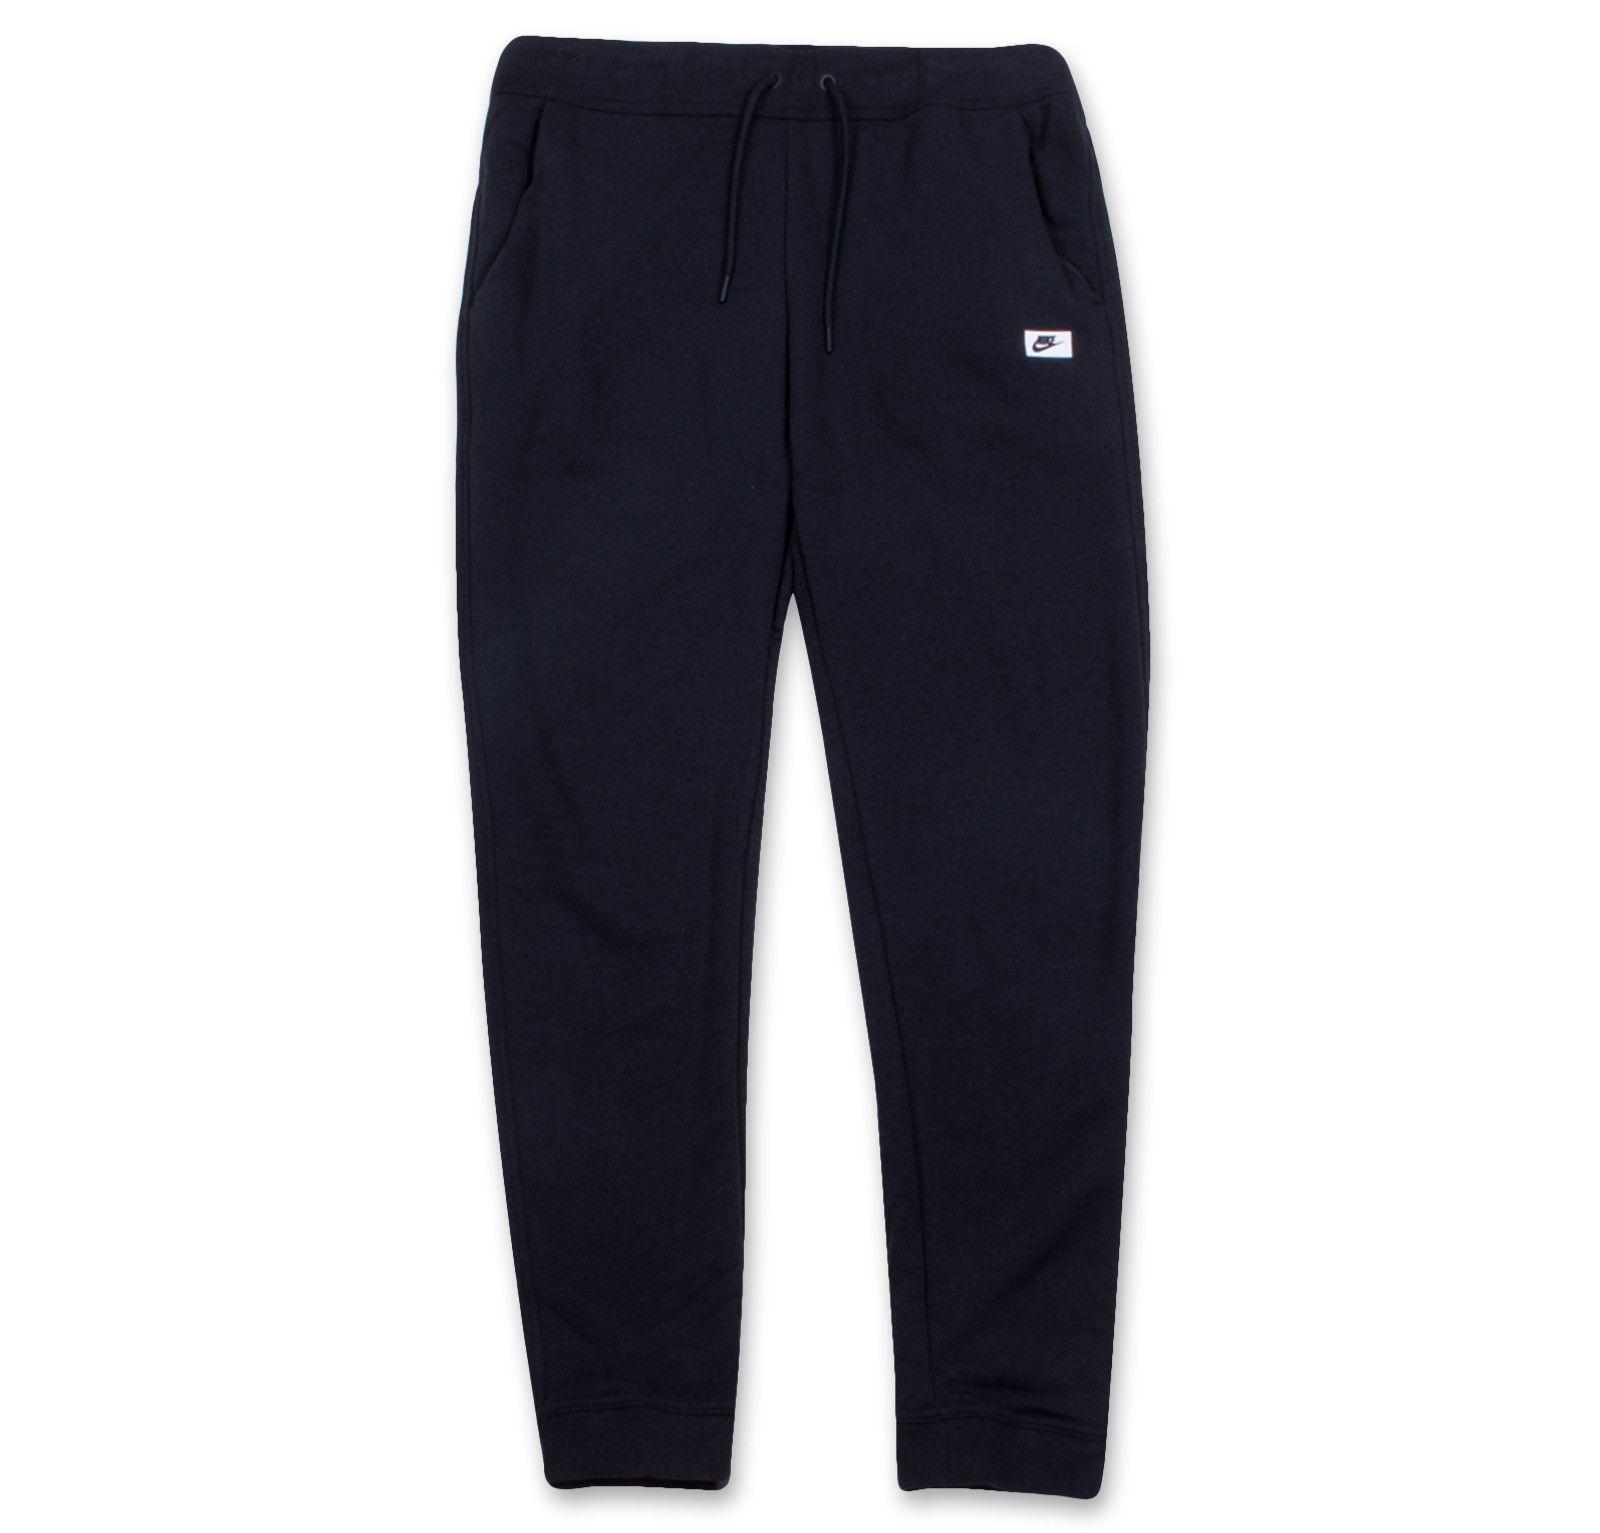 wholesale dealer b2a59 7e464 Nike Womens Sportswear Modern Pants   DTLR.com